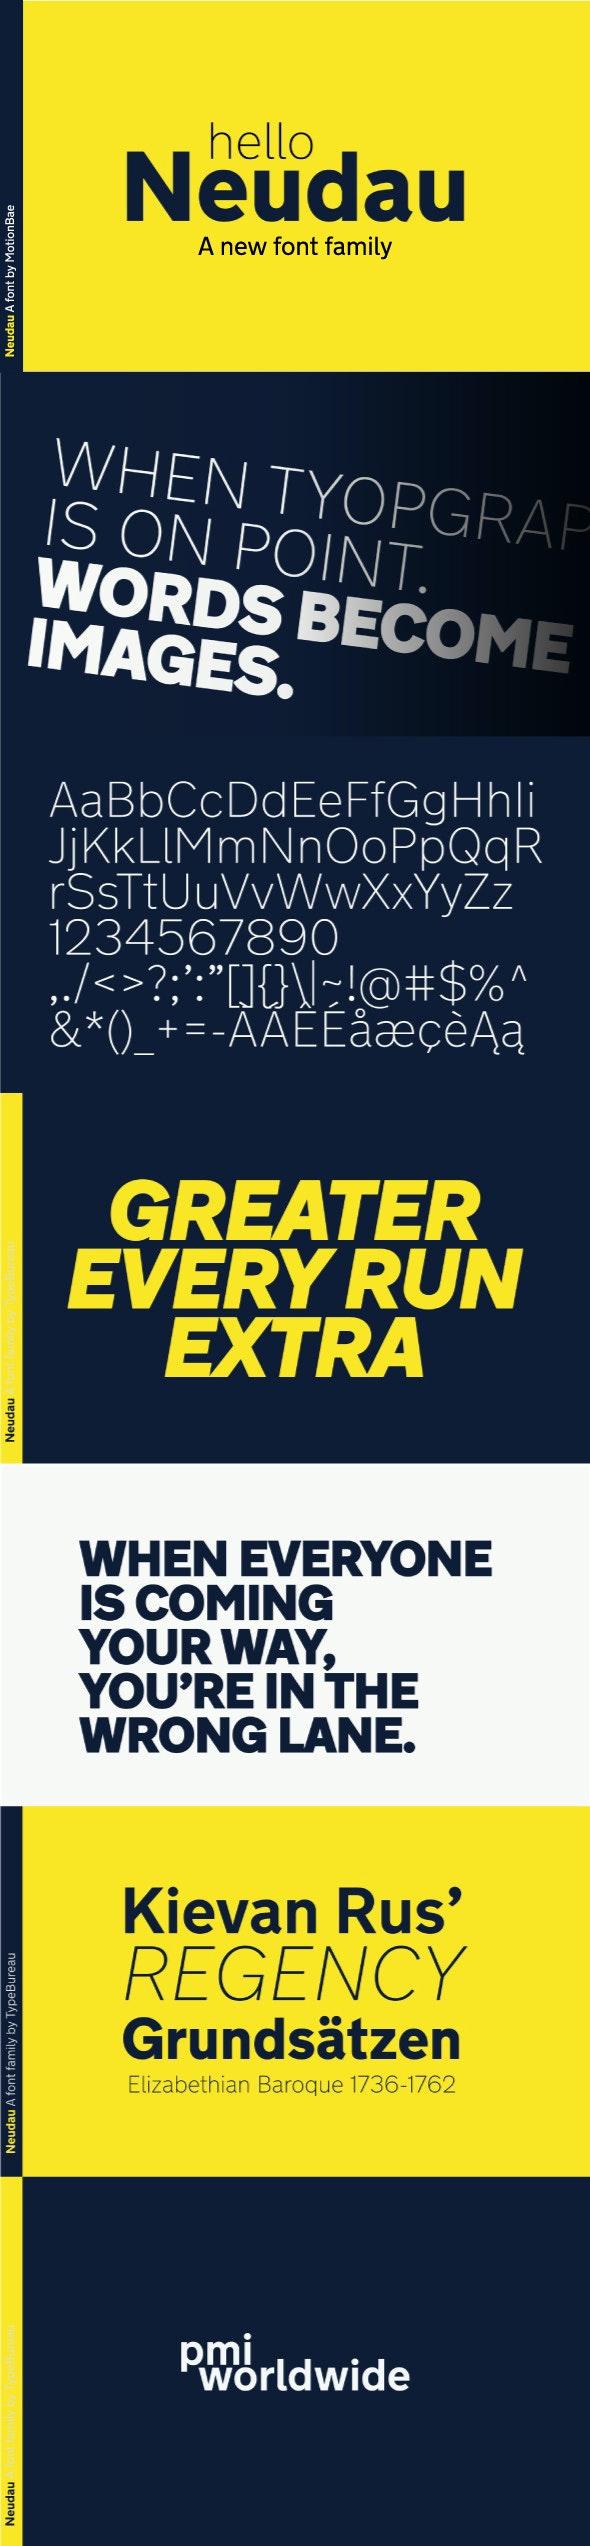 Neudau Sans Serif Font - Sans-Serif Fonts